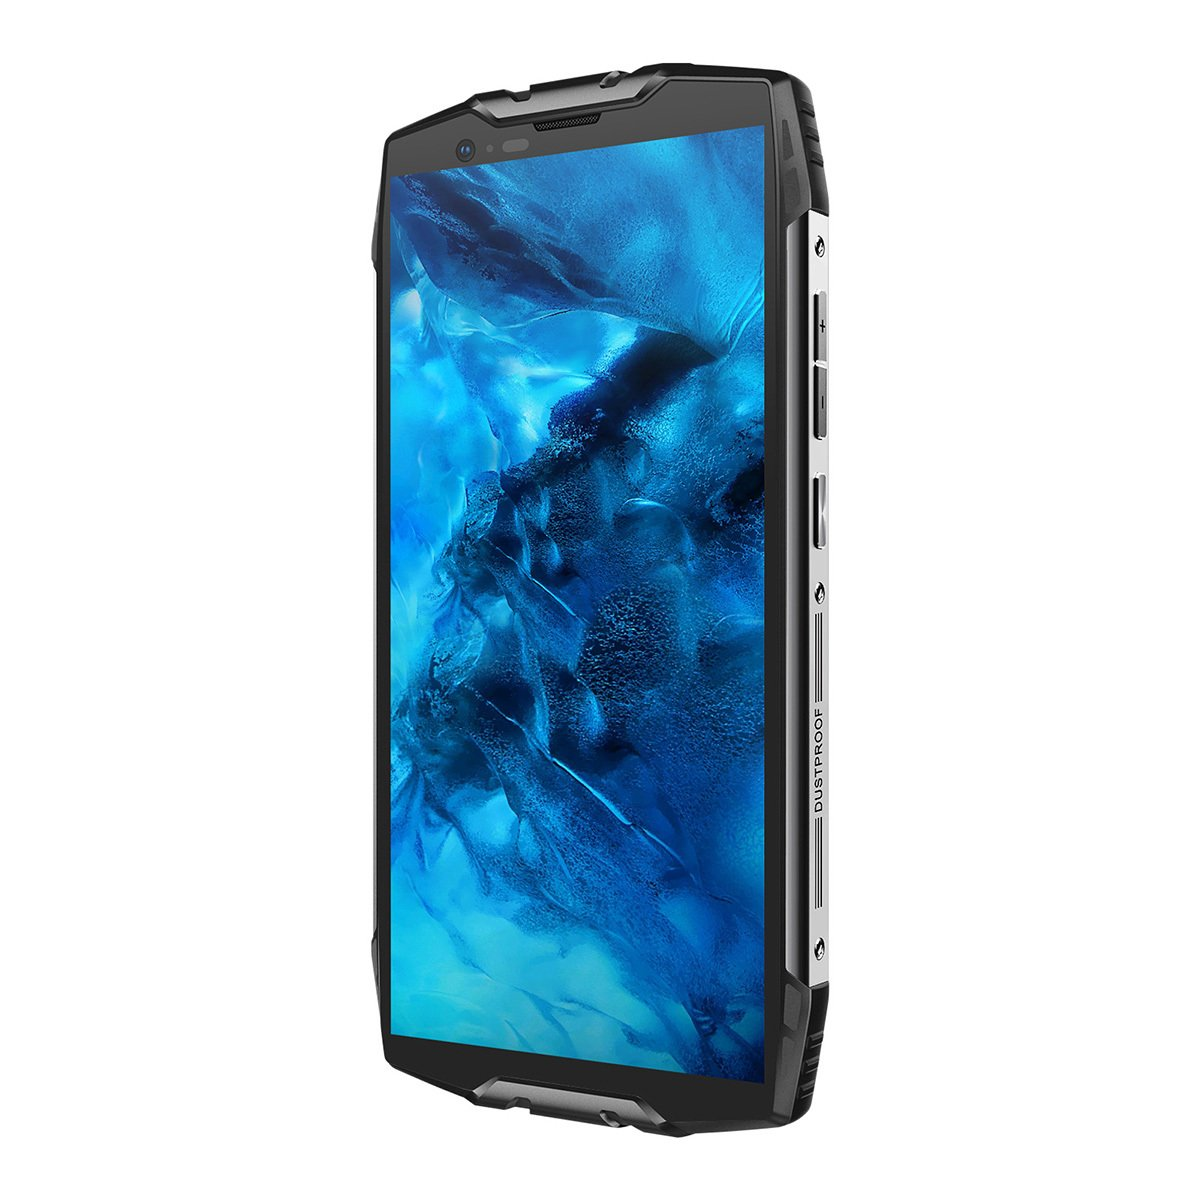 Смартфон Blackview BV6800 Pro 4/64Gb DS Black фото 9